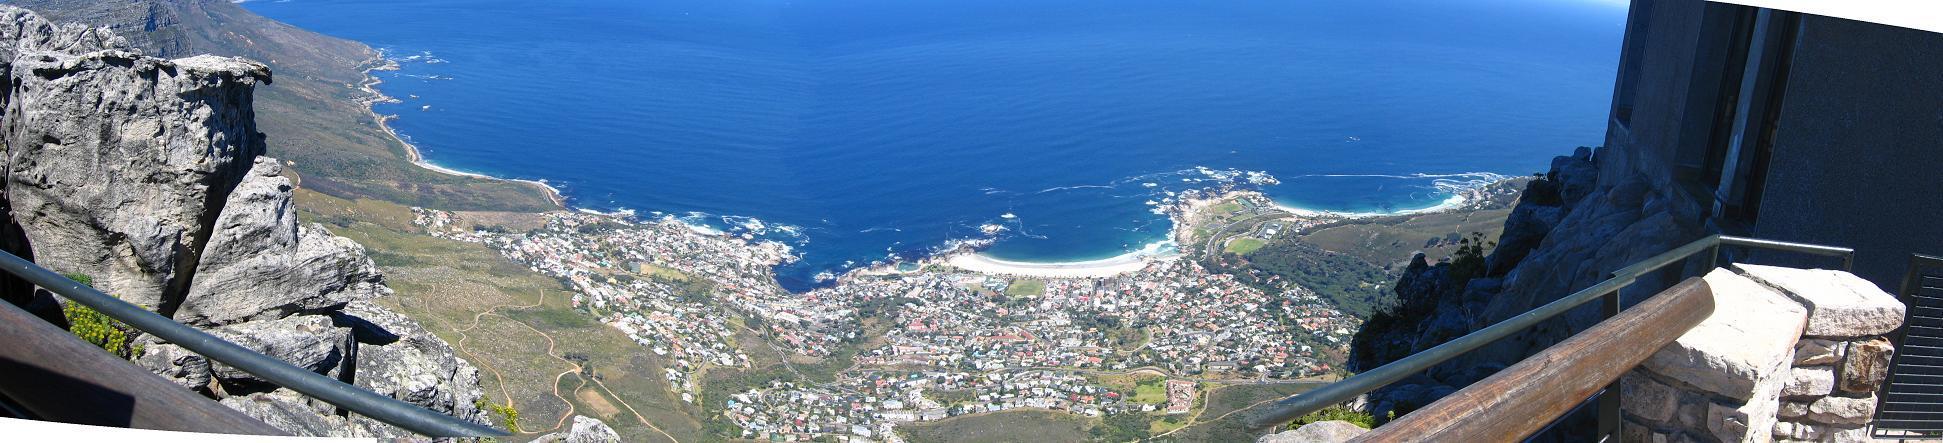 southafrica_capetown1.JPG